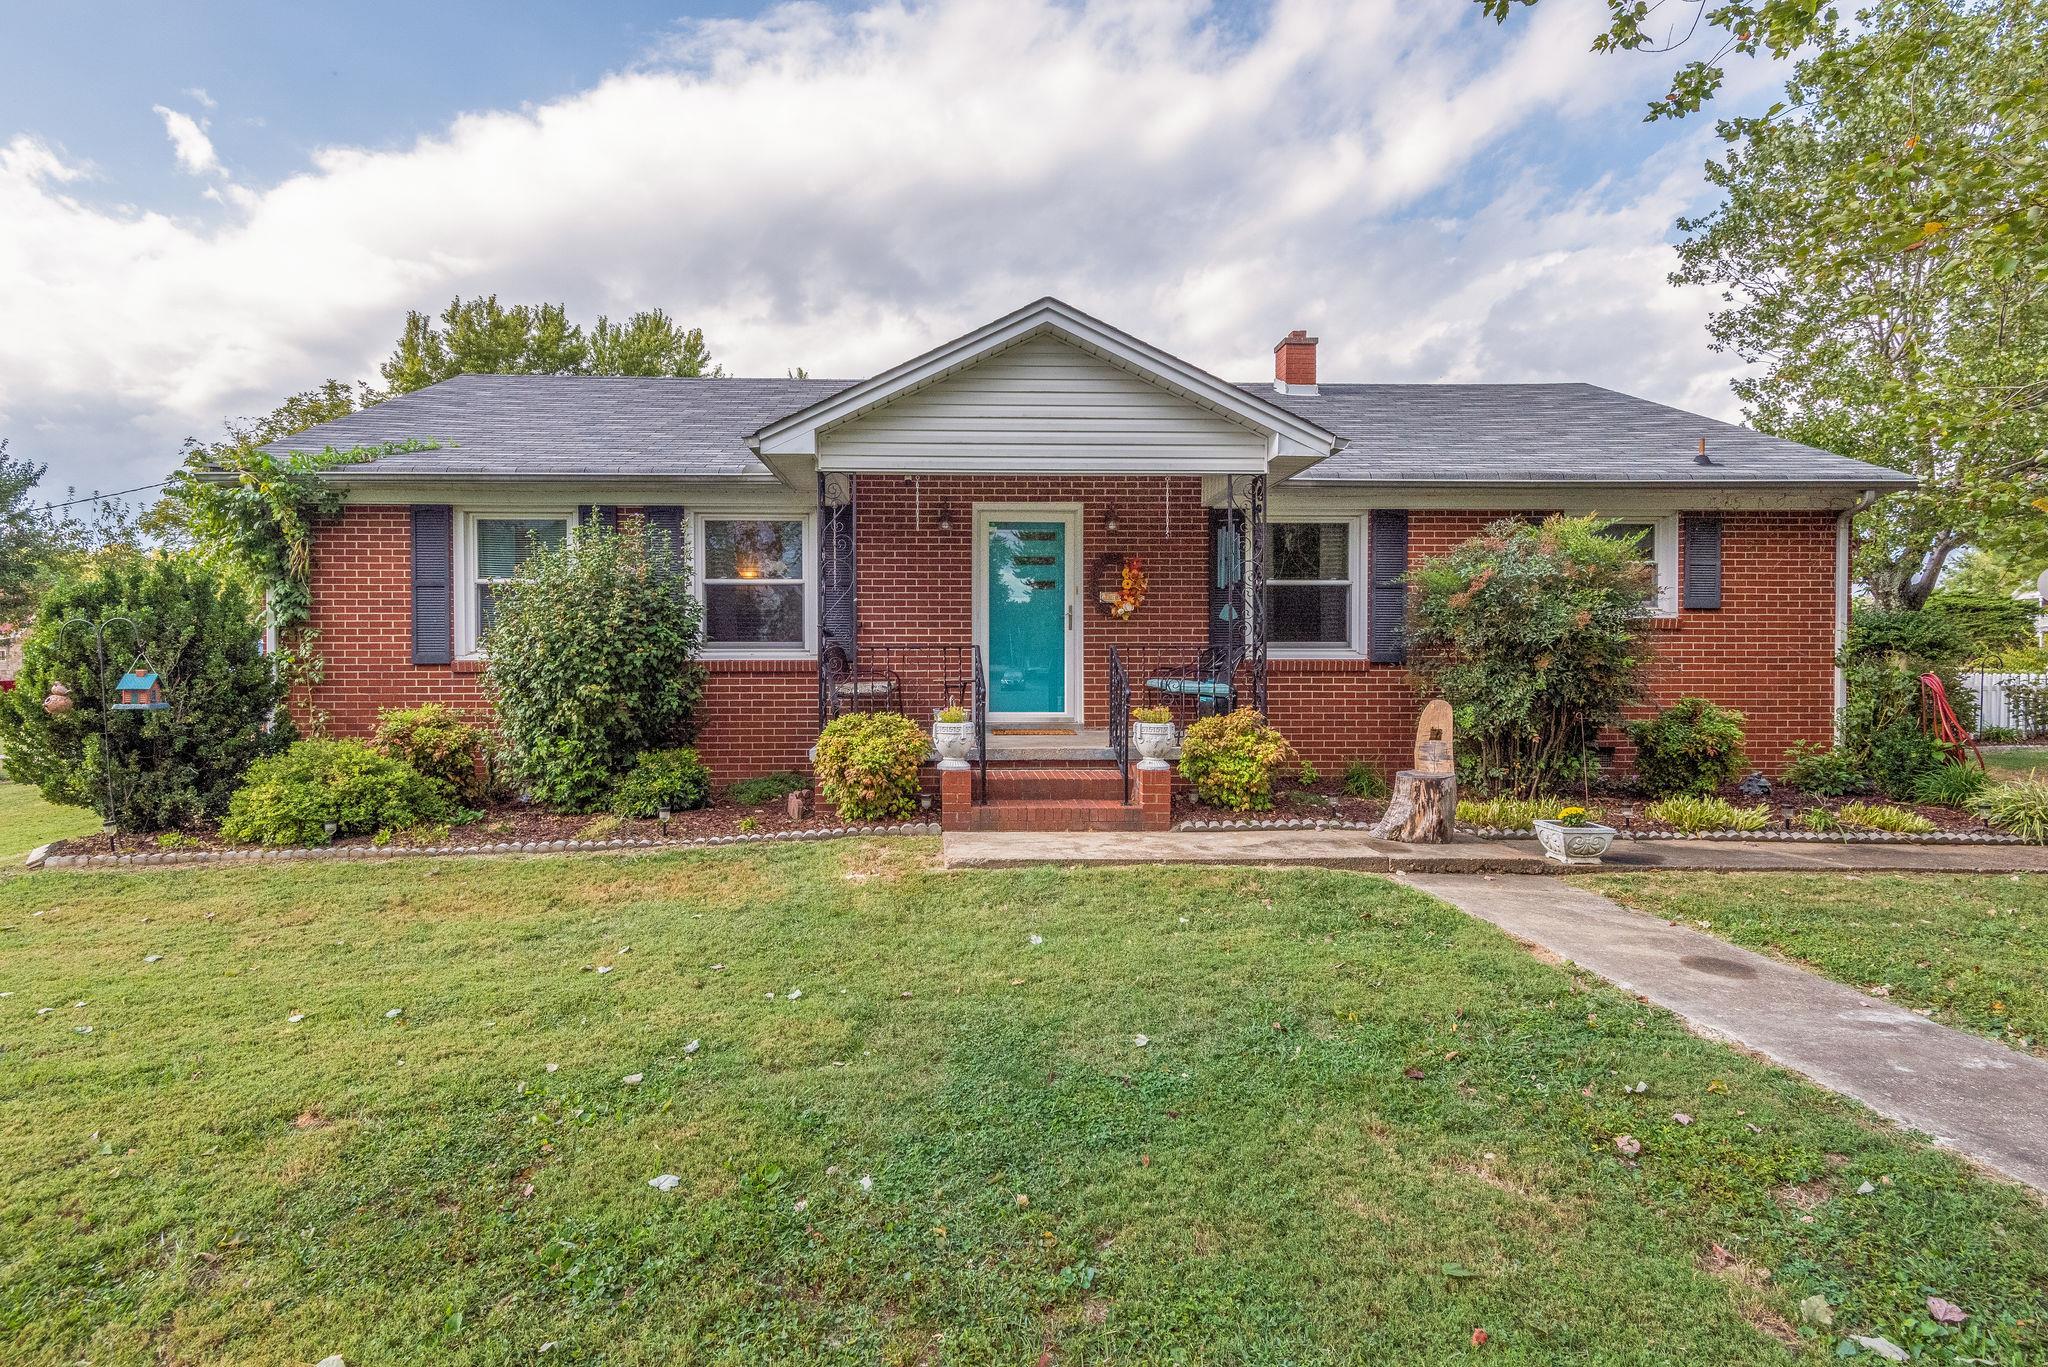 446 Railroad St, N, MC EWEN, TN 37101 - MC EWEN, TN real estate listing